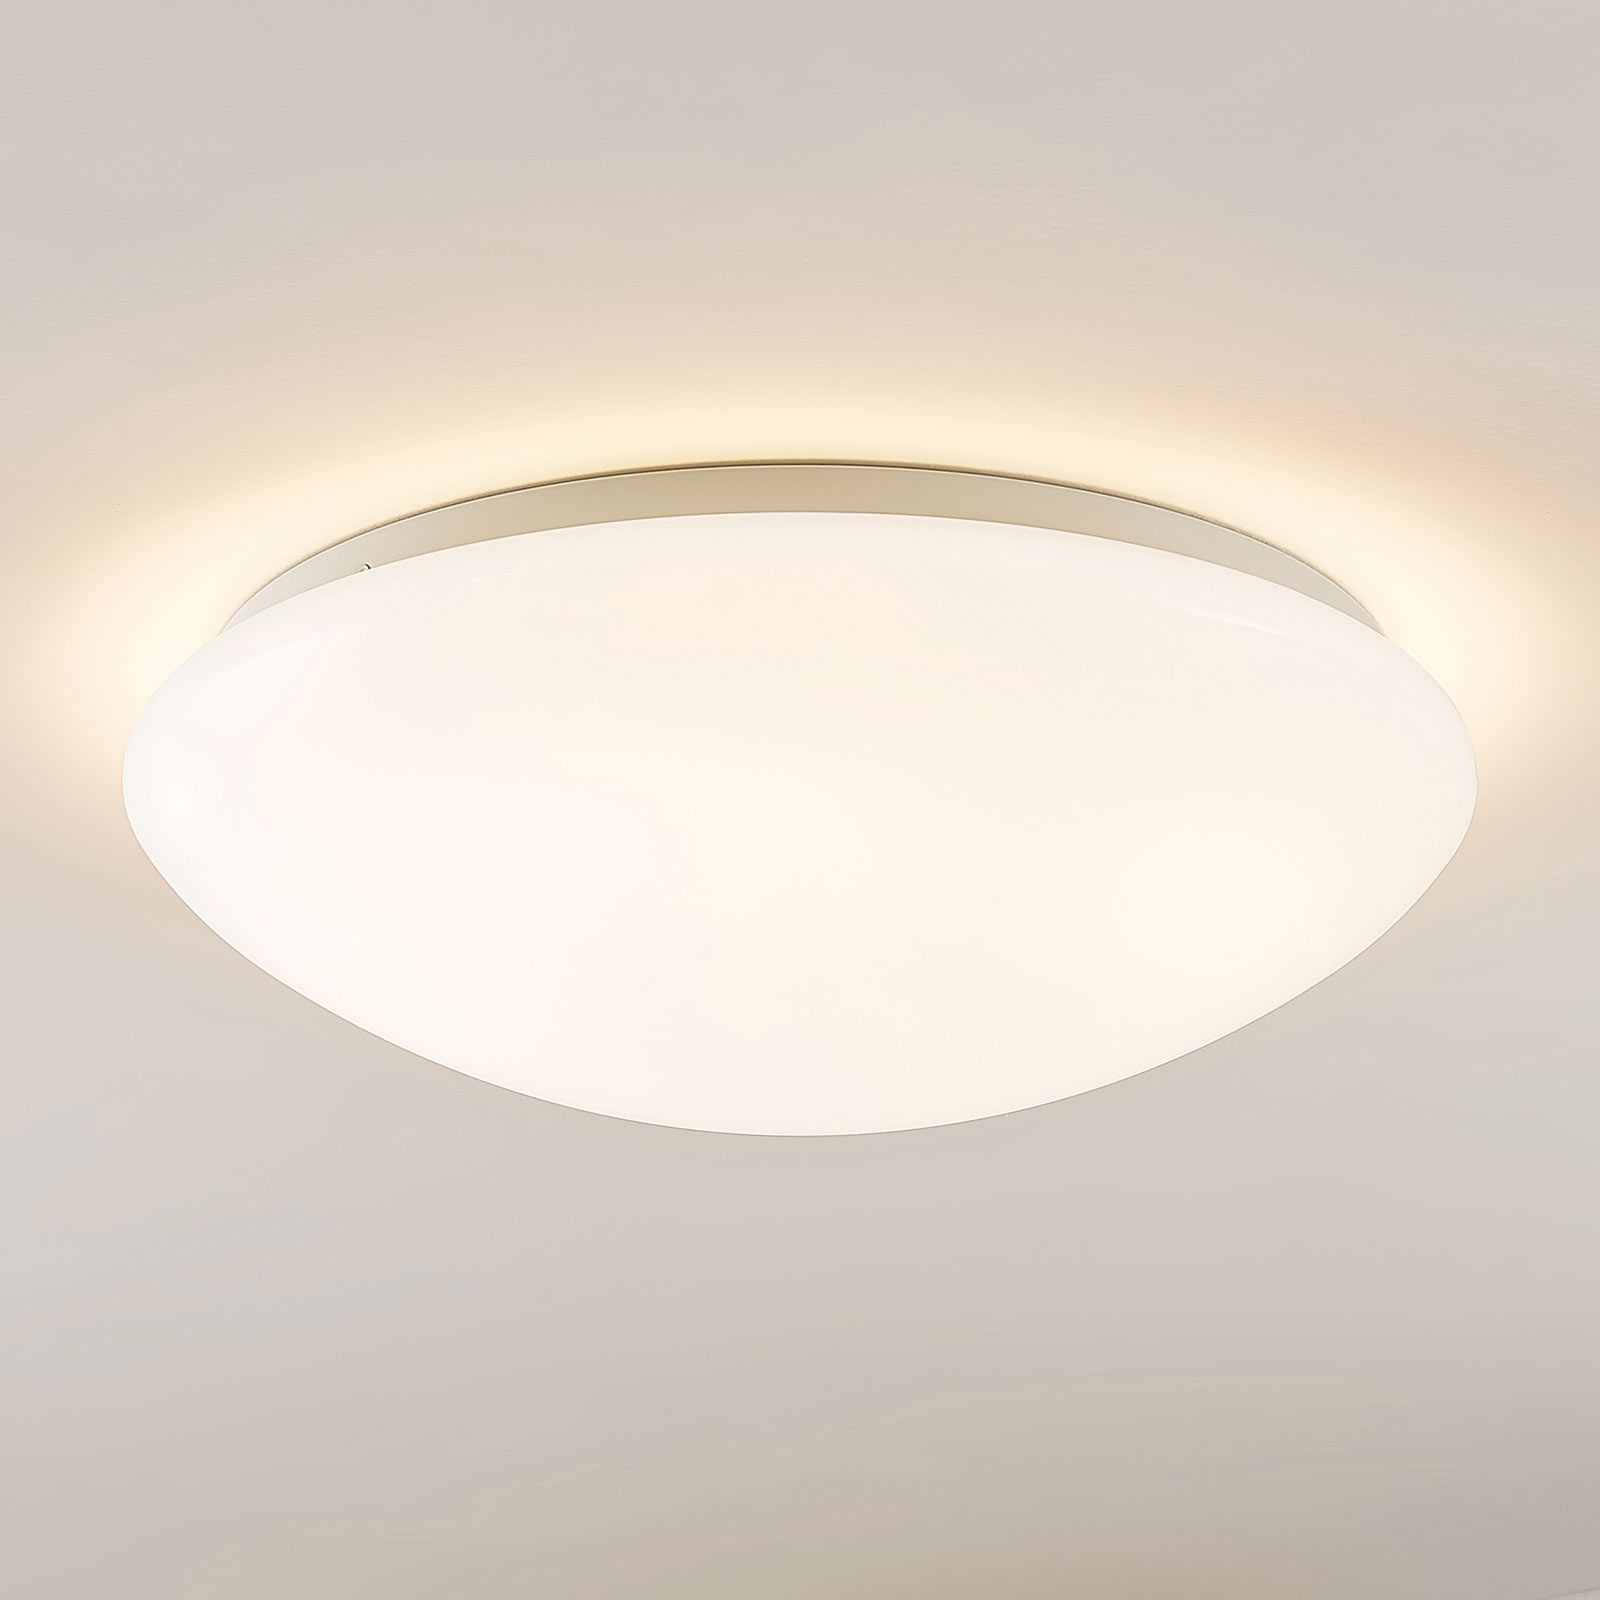 Arcchio Younes lampa sufitowa LED, biała, 40 cm